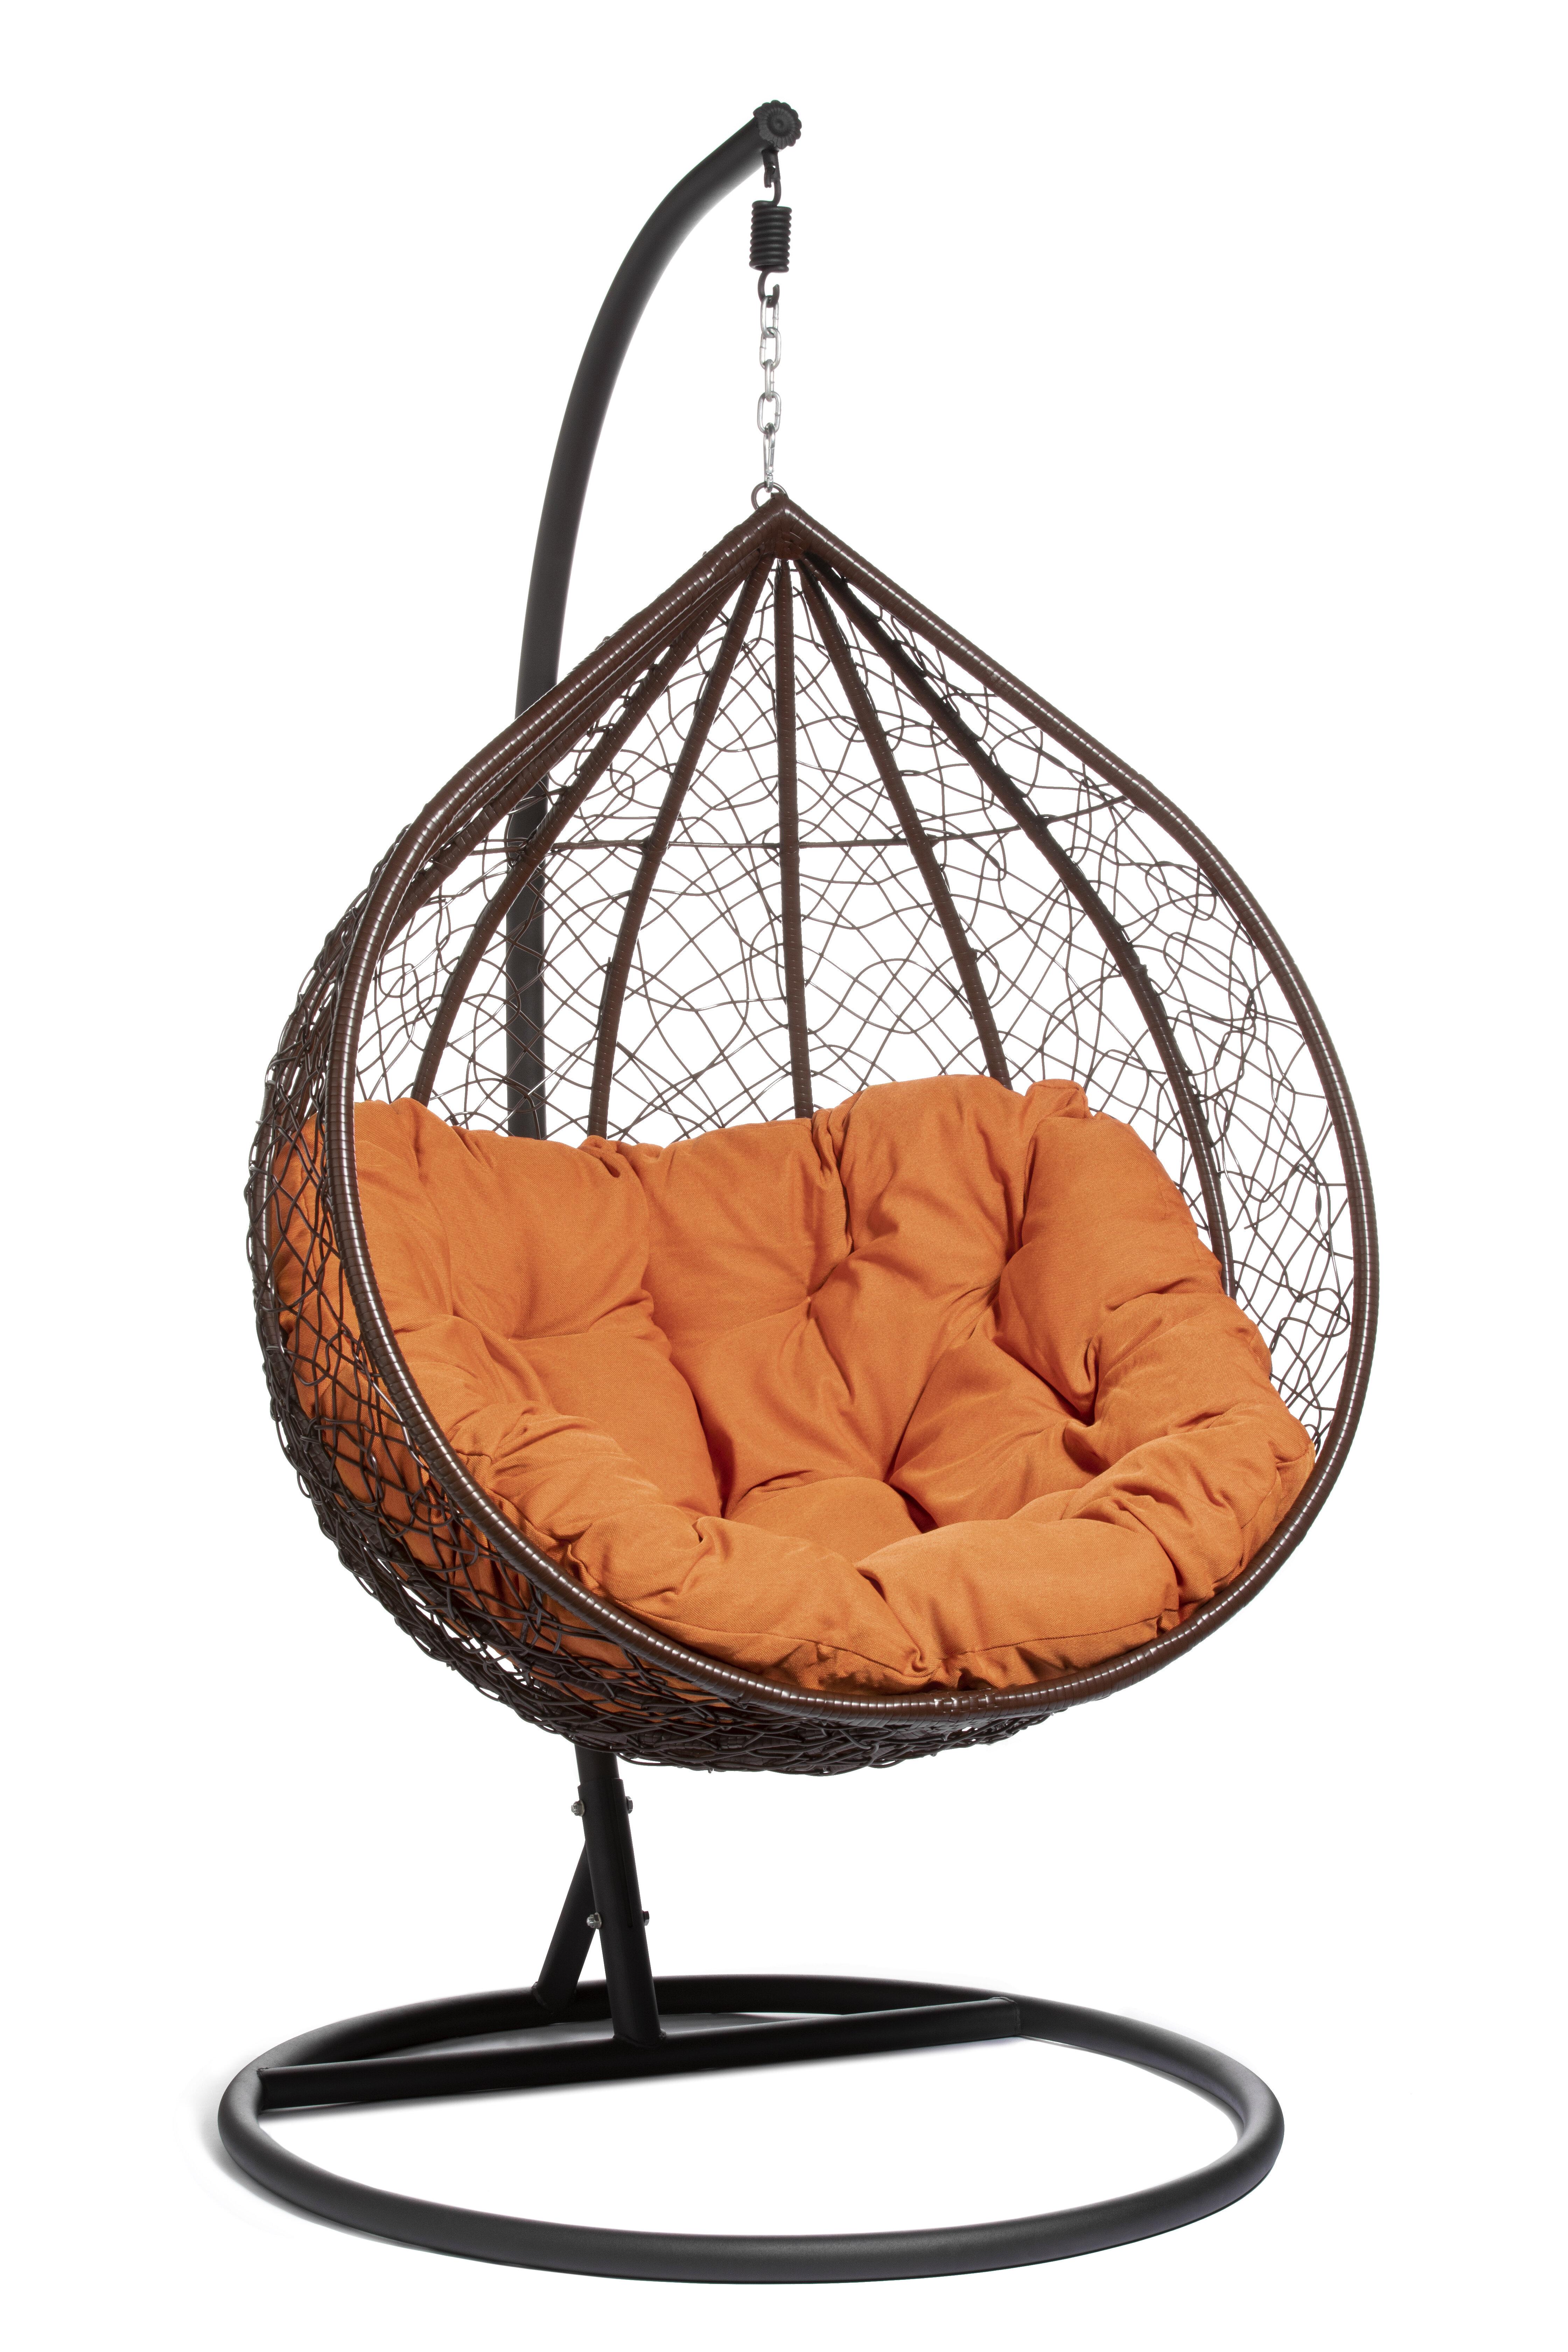 Brayden Studio Yorba Hanging Swing Chair With Stand Reviews Wayfair